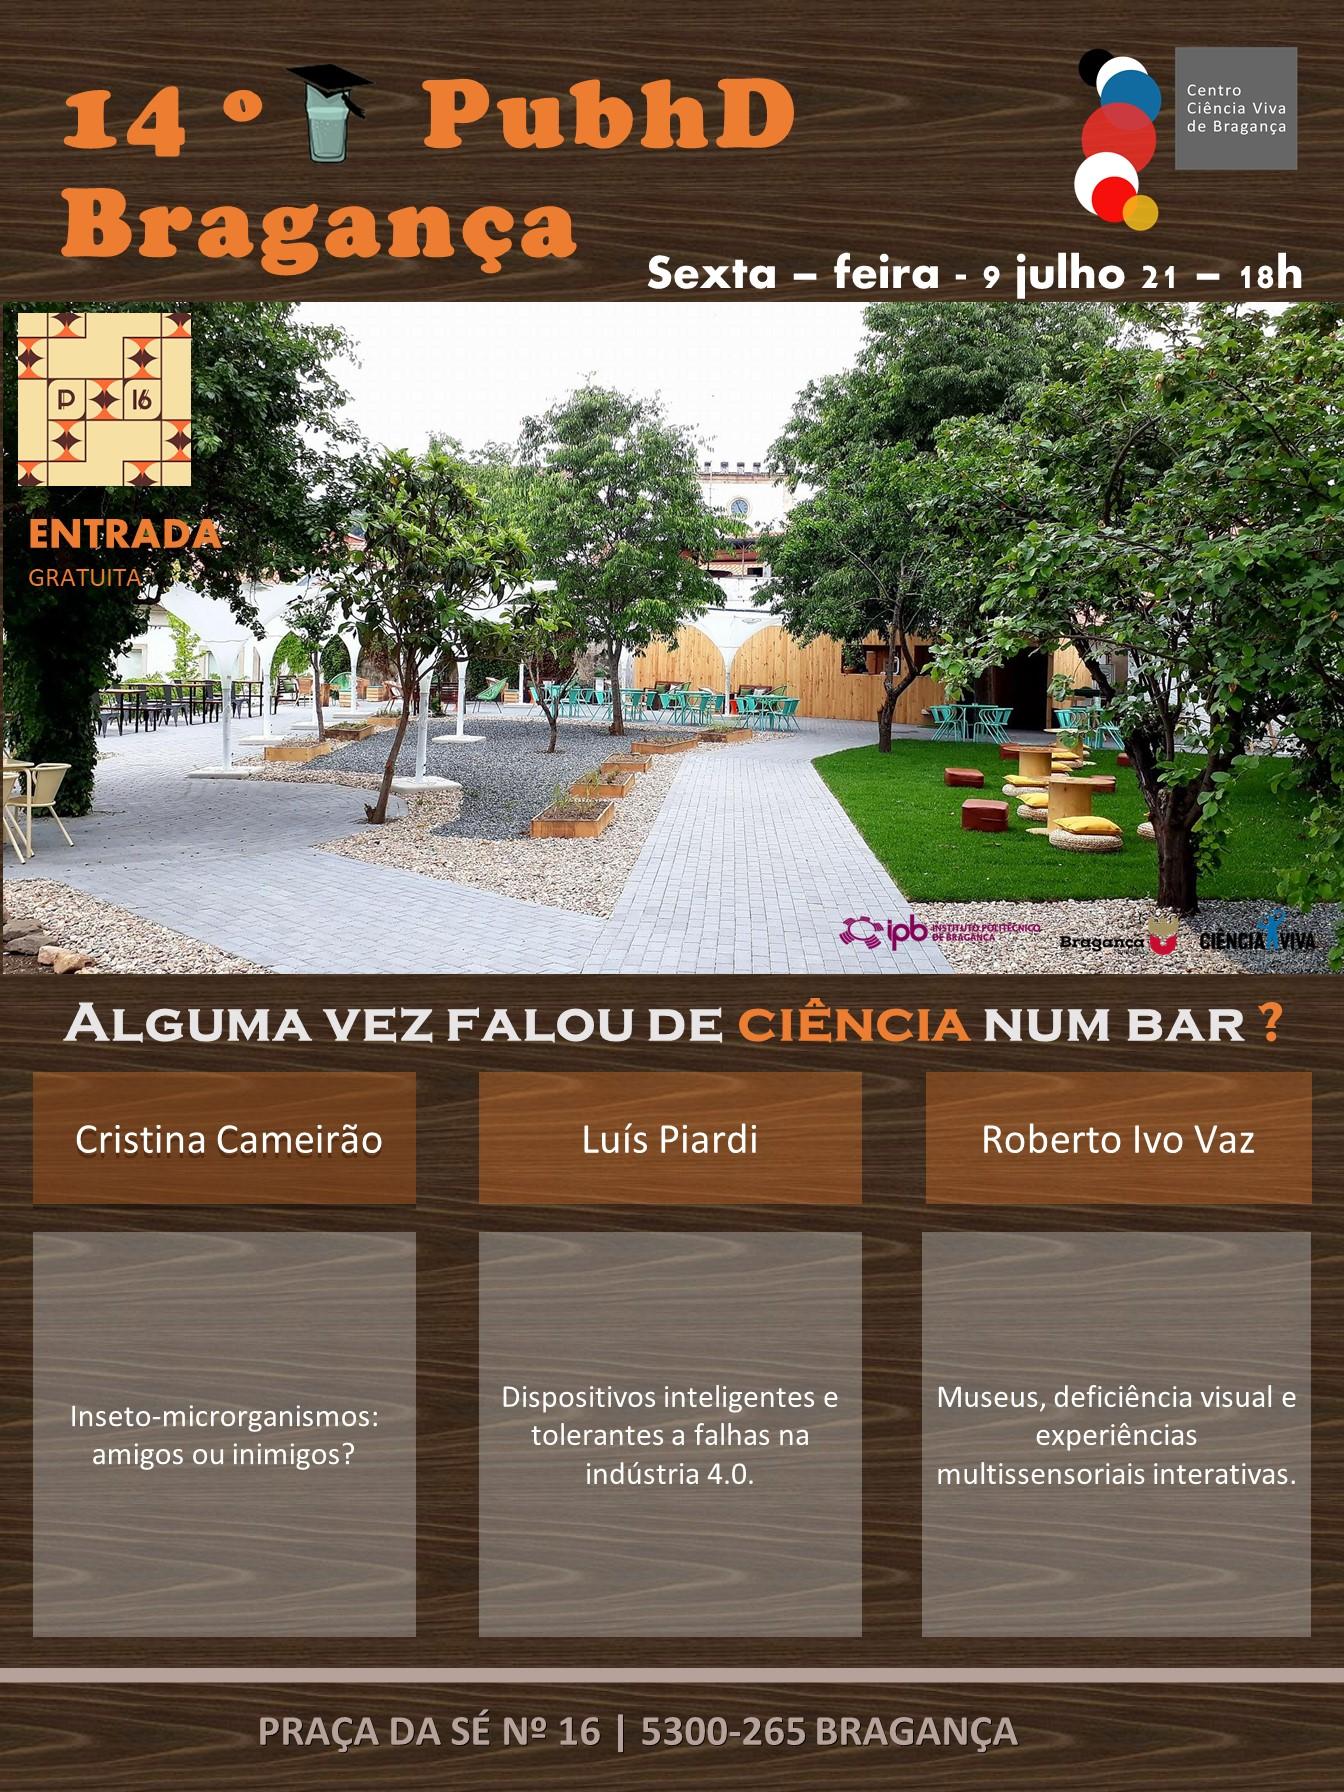 14.o PubhD Bragança